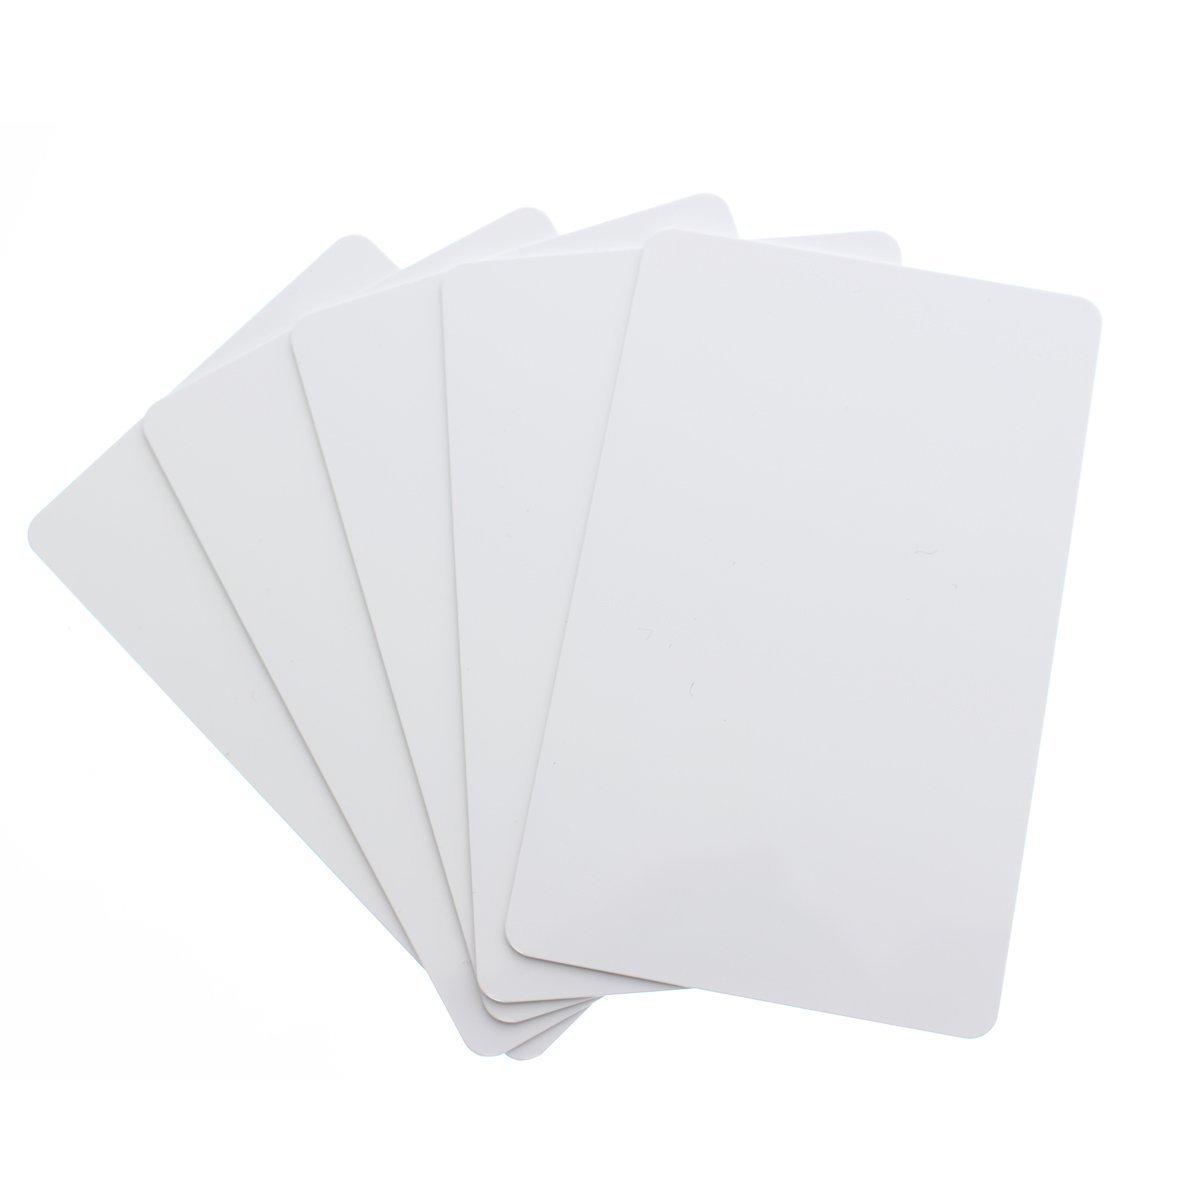 SHOPEASY Carte PVC Vierge pour Impression Badge Blanc CR80 30Mil  - White Blank PVC Plastic Cards for Photo ID card Printers (DataCard, Zebra, Fargo, Evolis, Magicard, NB)